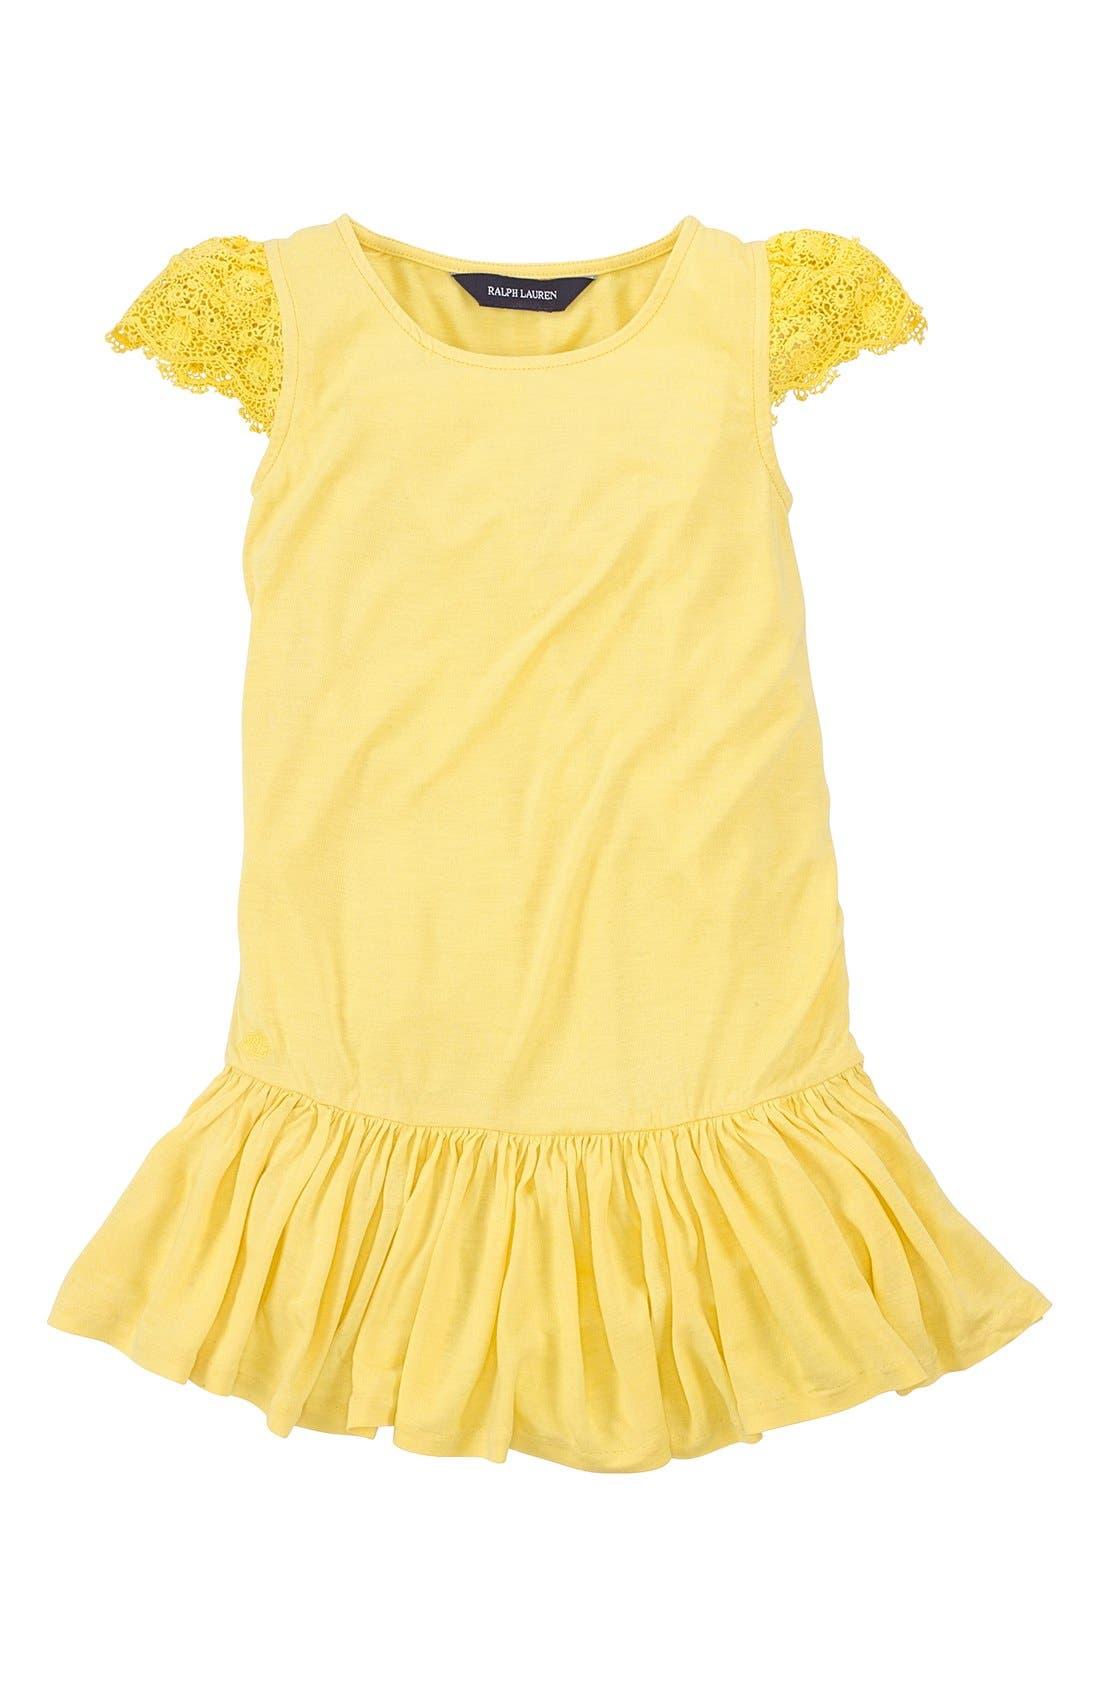 Main Image - Ralph Lauren Lace Sleeve Dress (Toddler Girls)